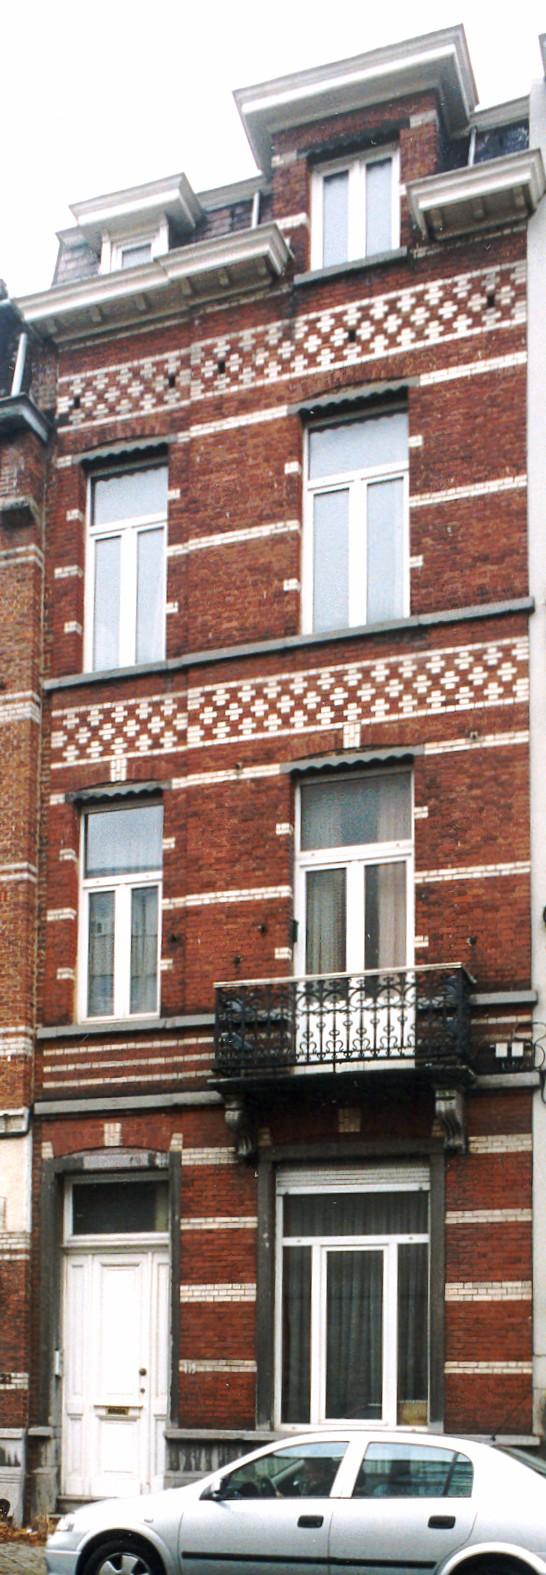 Rue Antoine Bréart 119., 2003